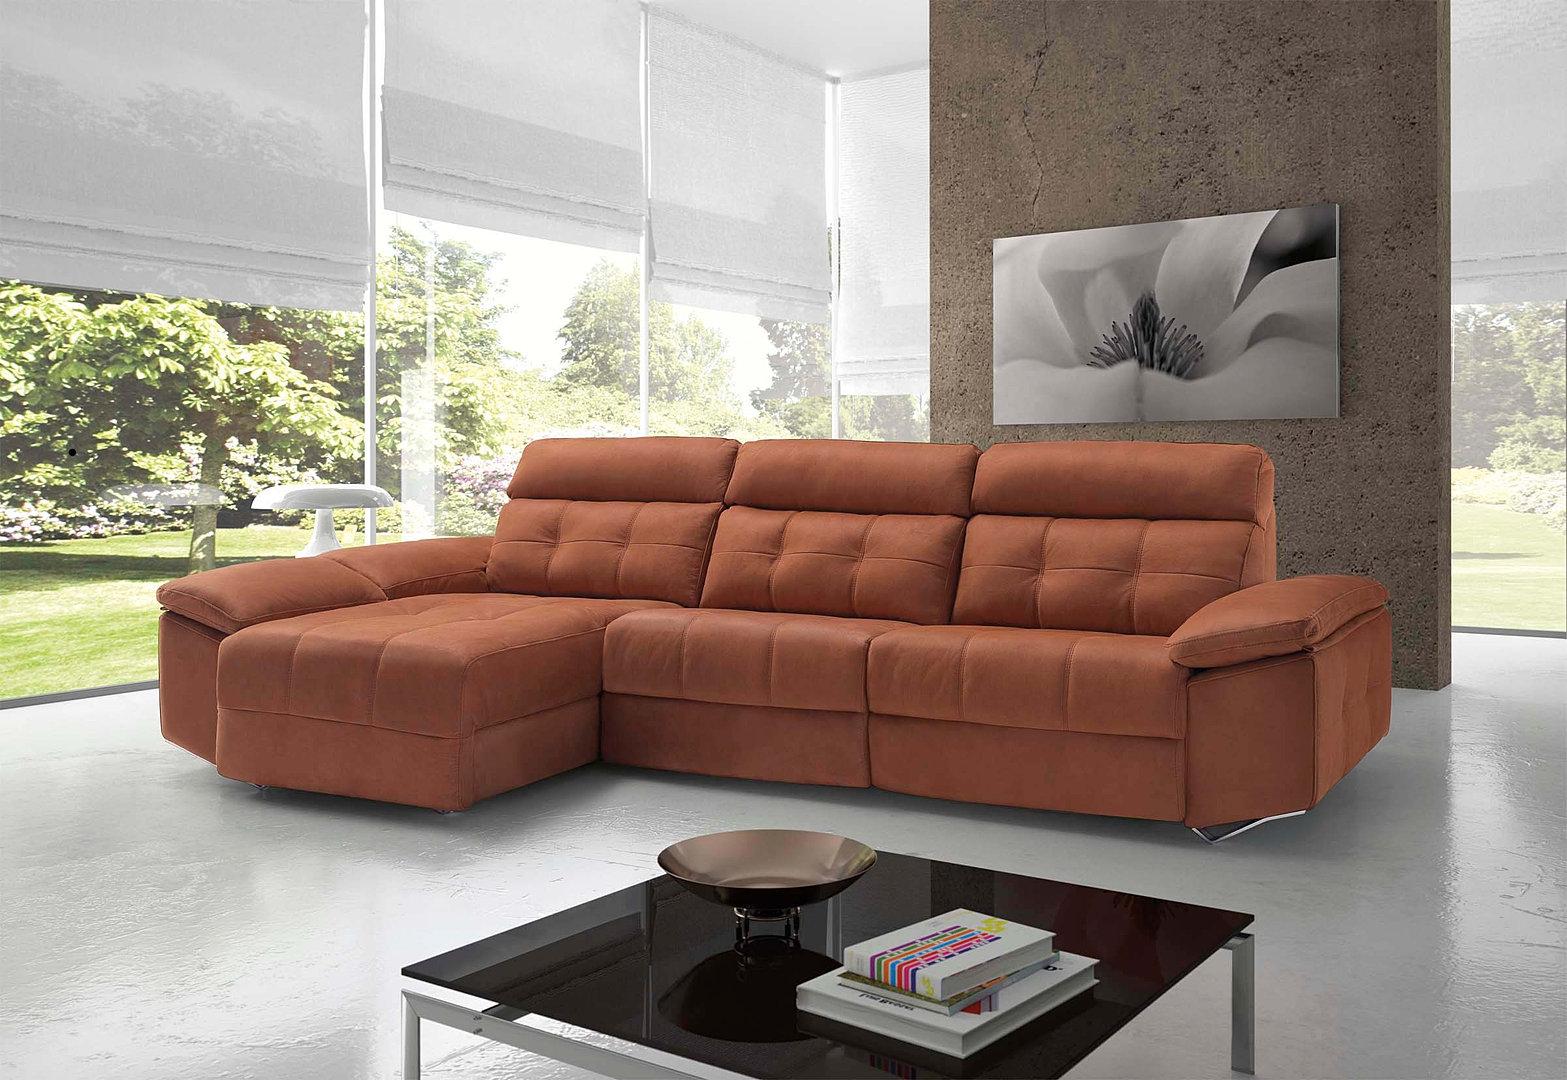 Tienda De Muebles Algeciras : Sofass málaga sofás chaiselongues en